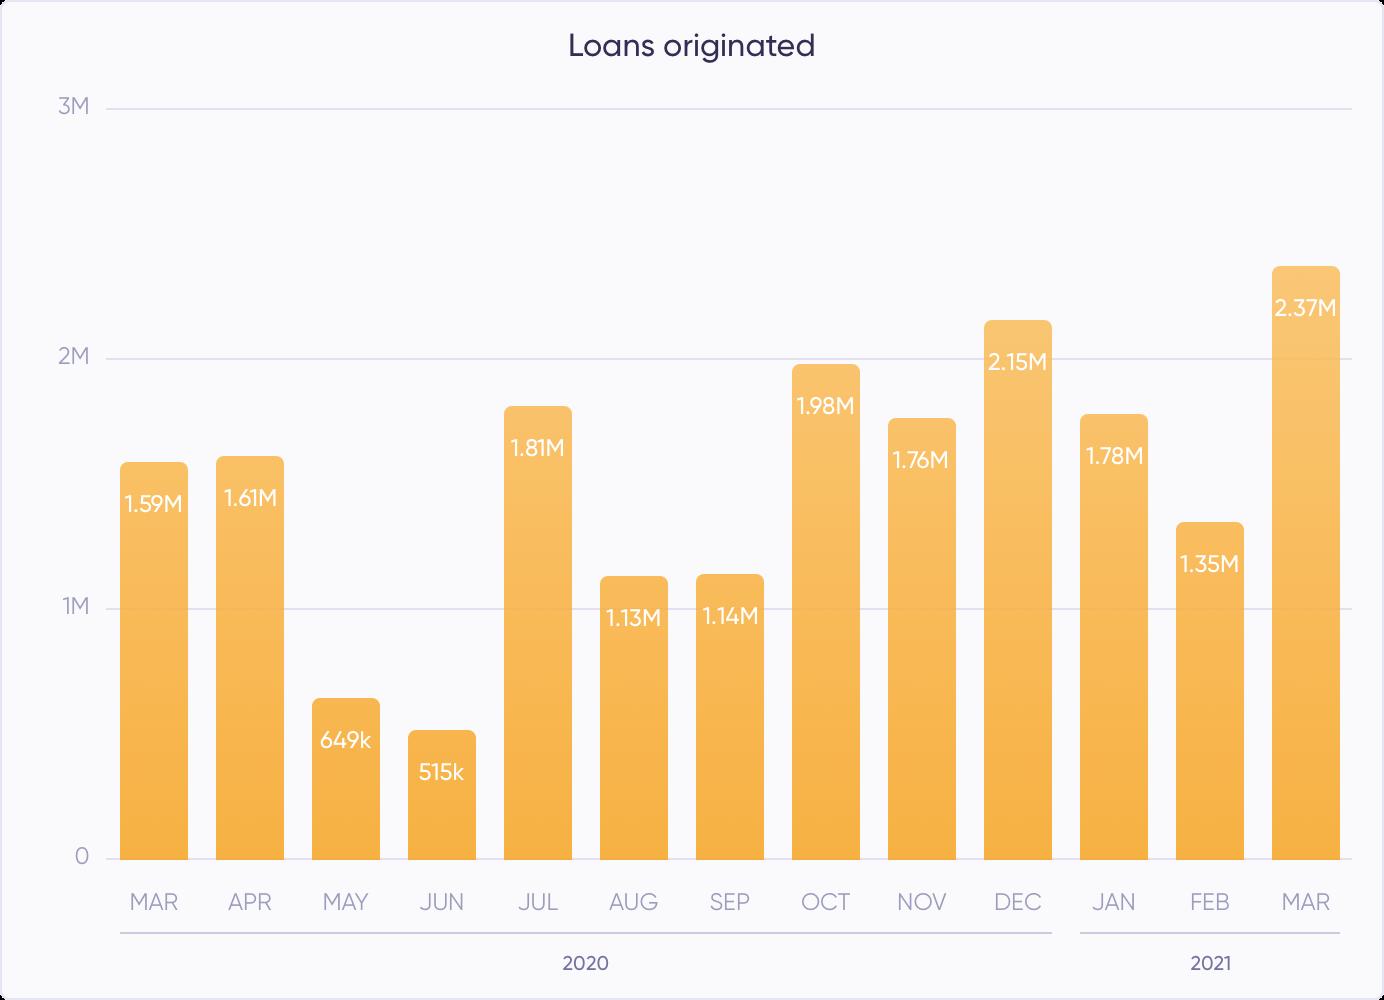 Loans originated in March